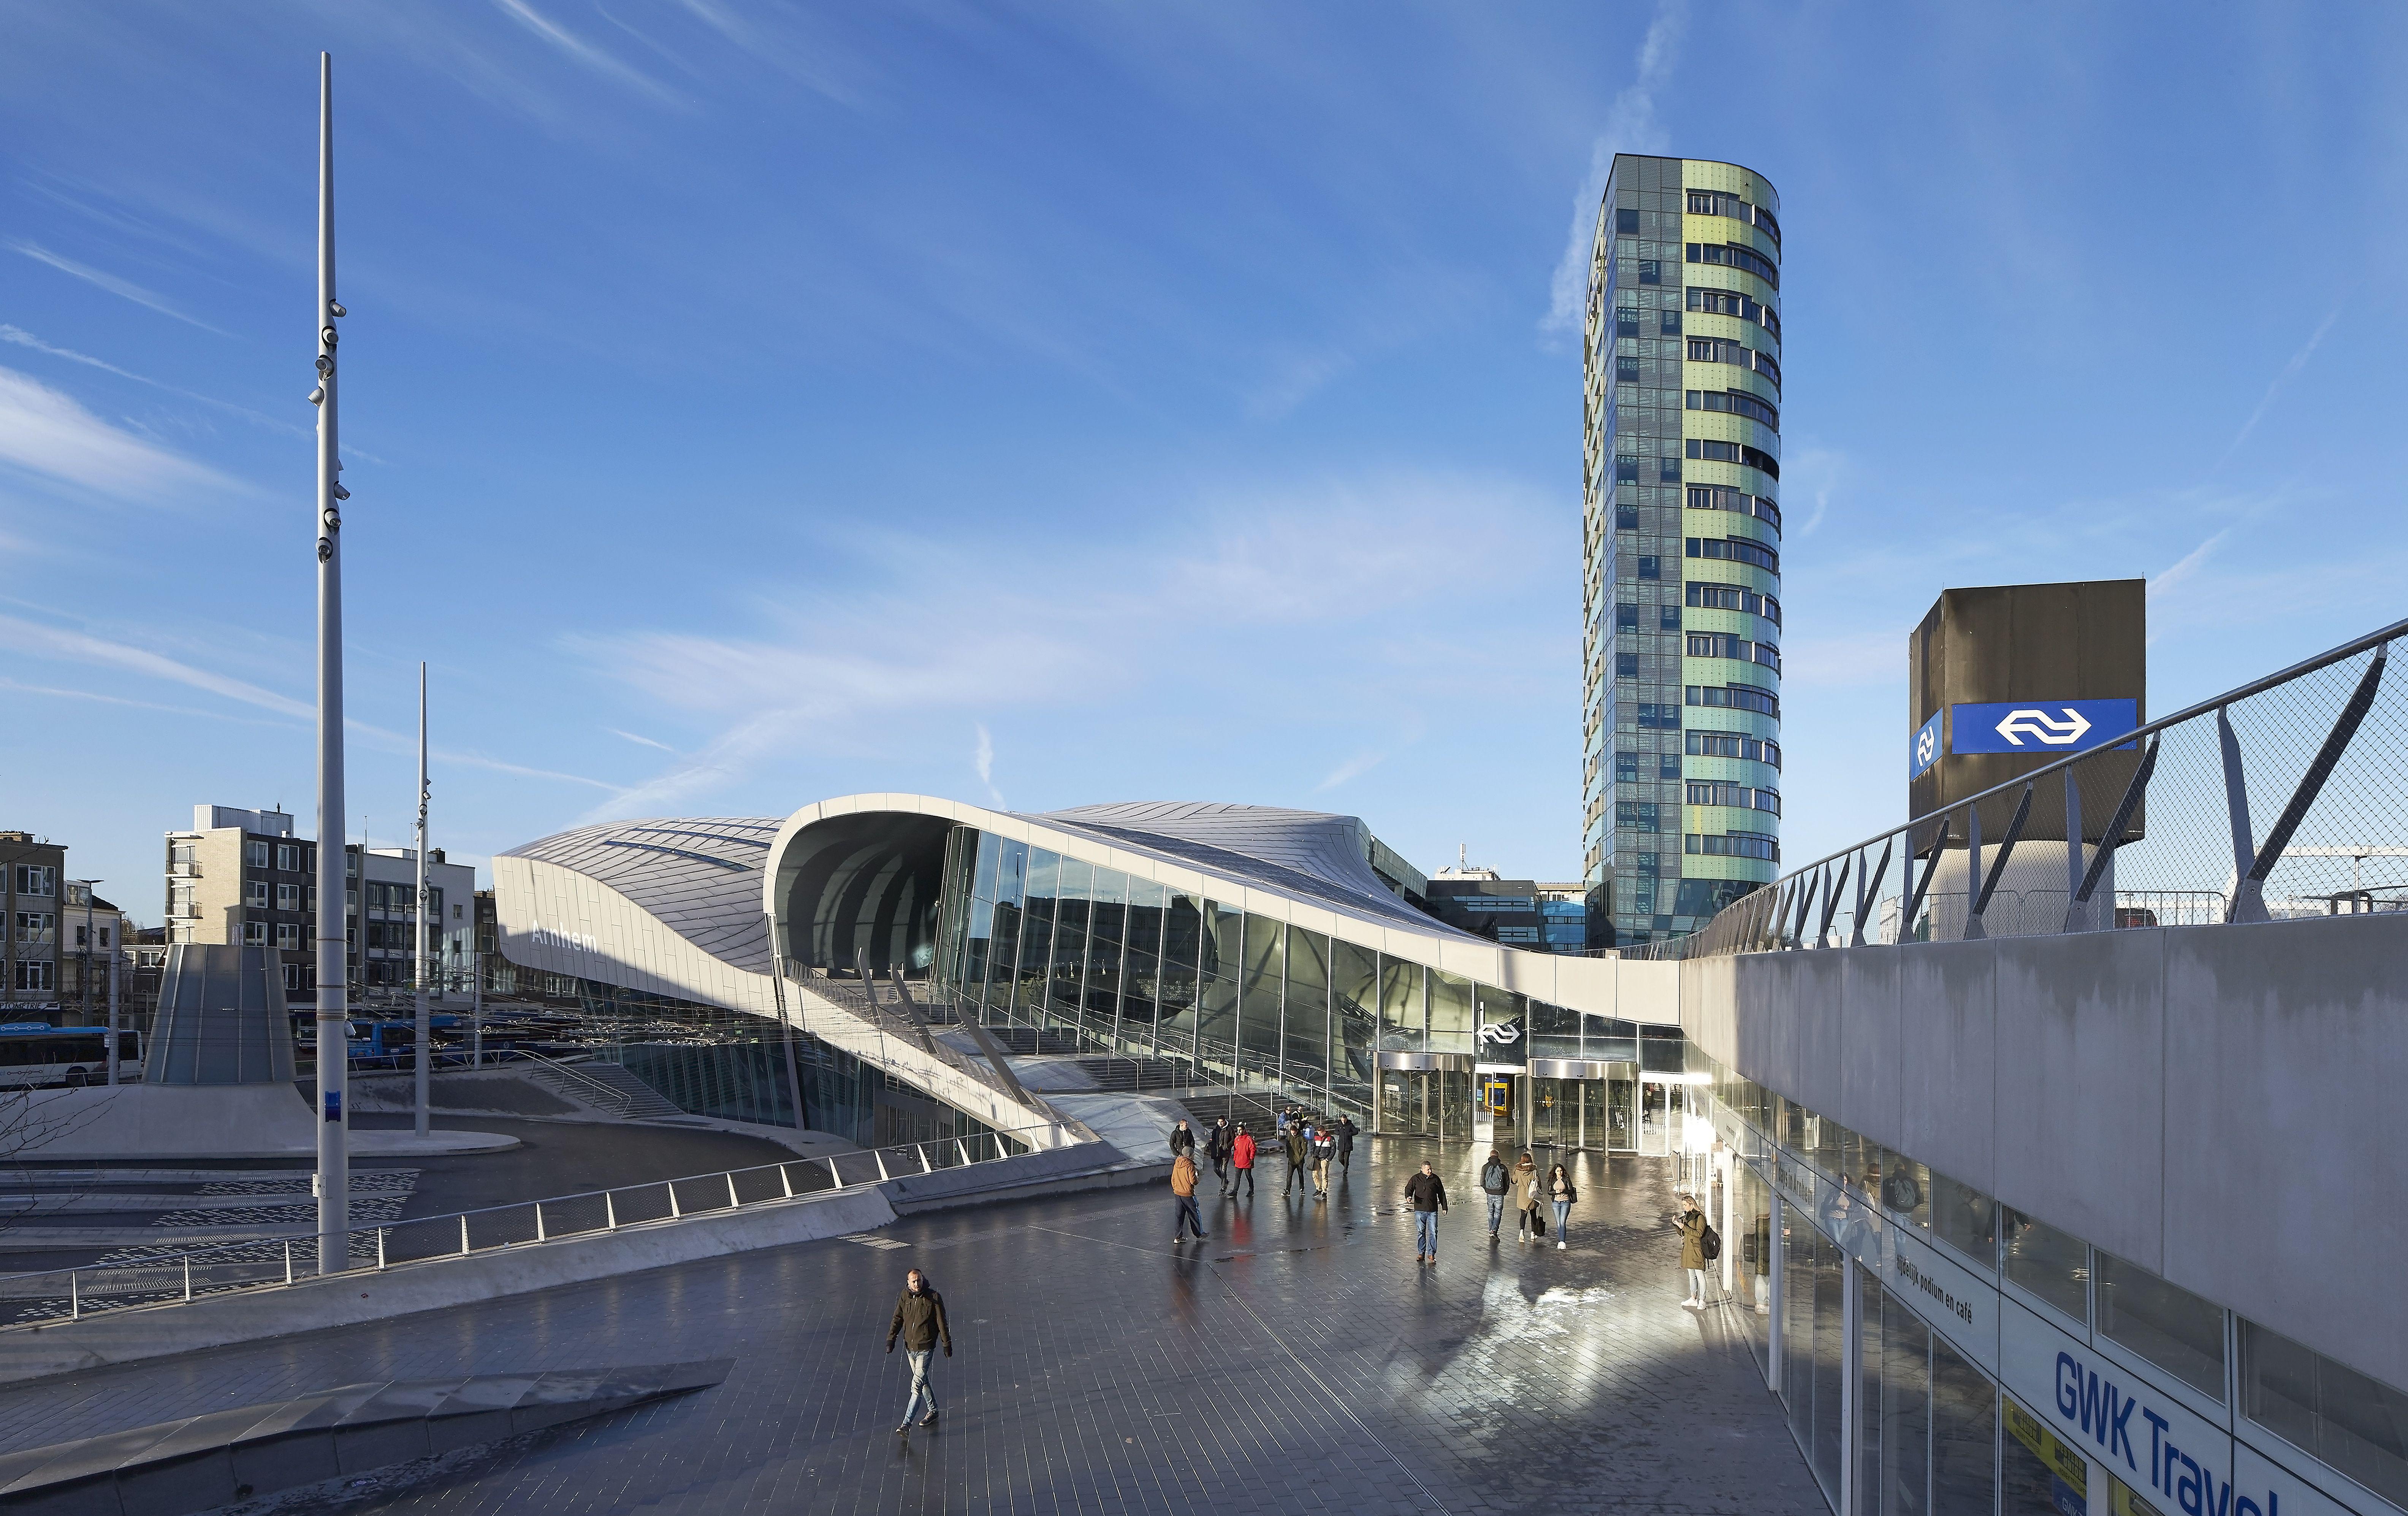 Ov terminal arnhem » bouwwereld.nl